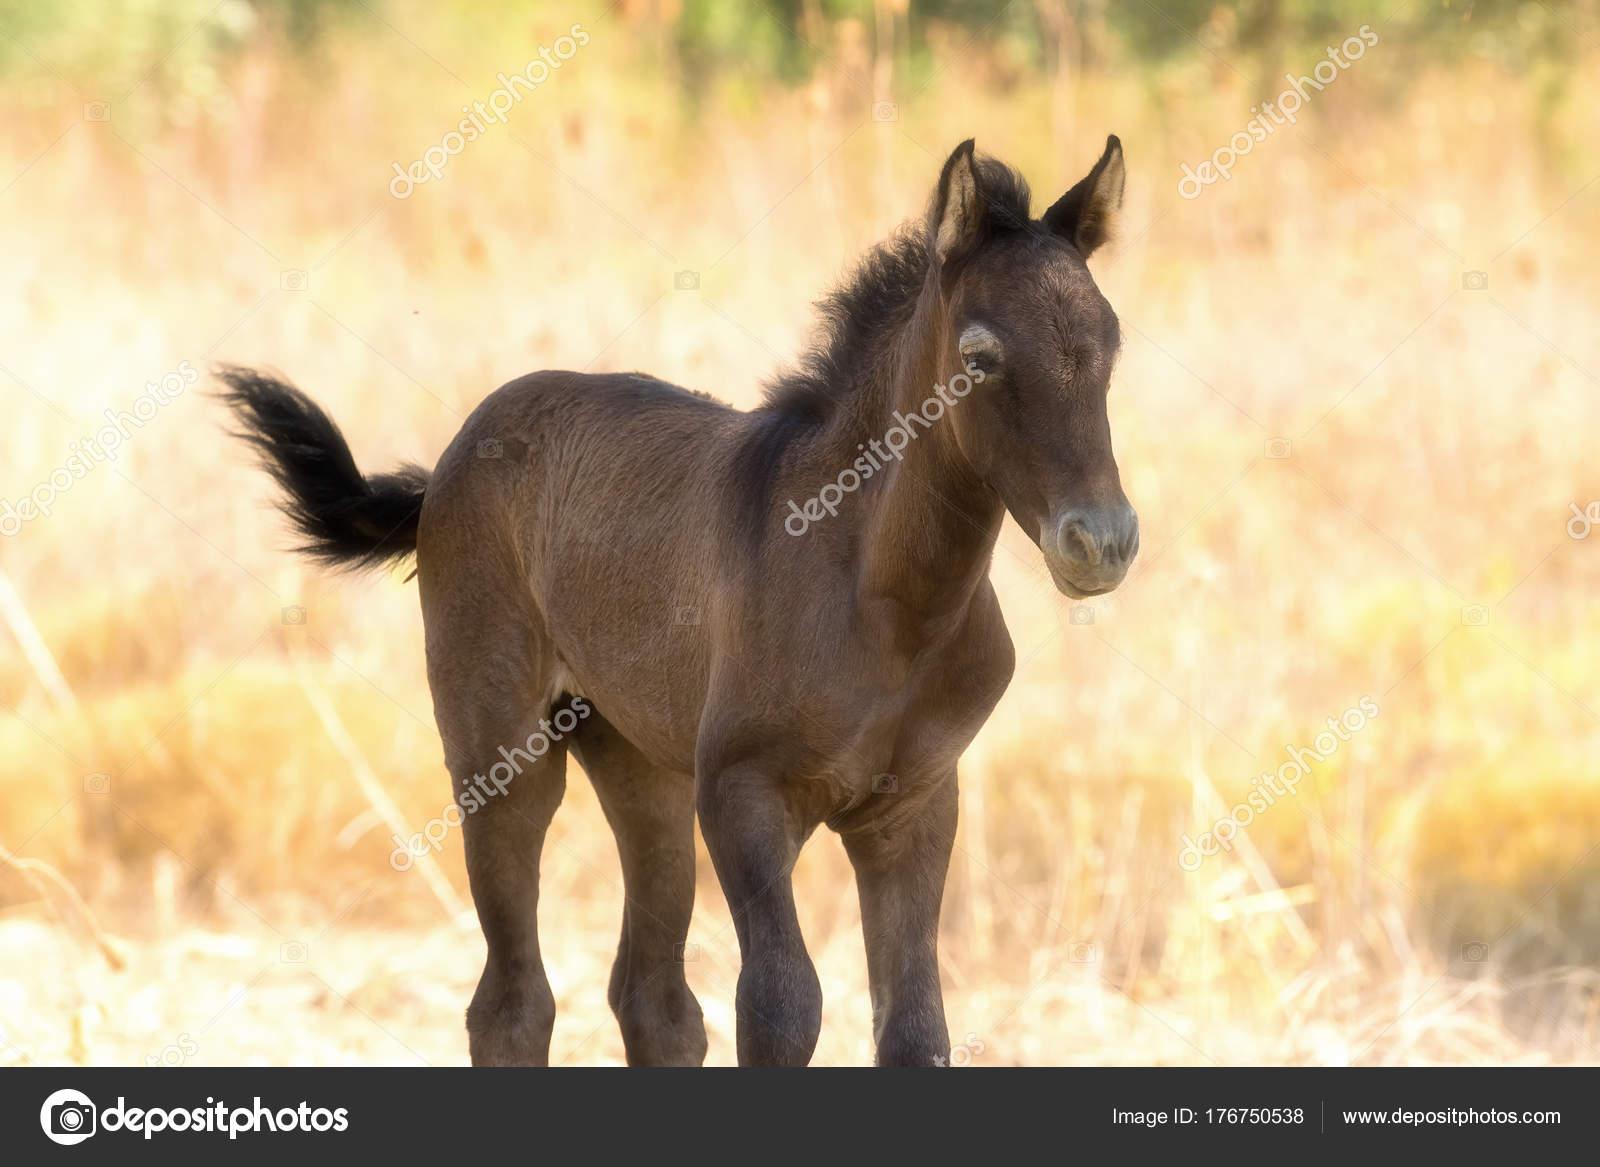 Brown Baby Horse Brown Baby Horse Portrait Close Motion Stock Photo C Bilisanas 176750538